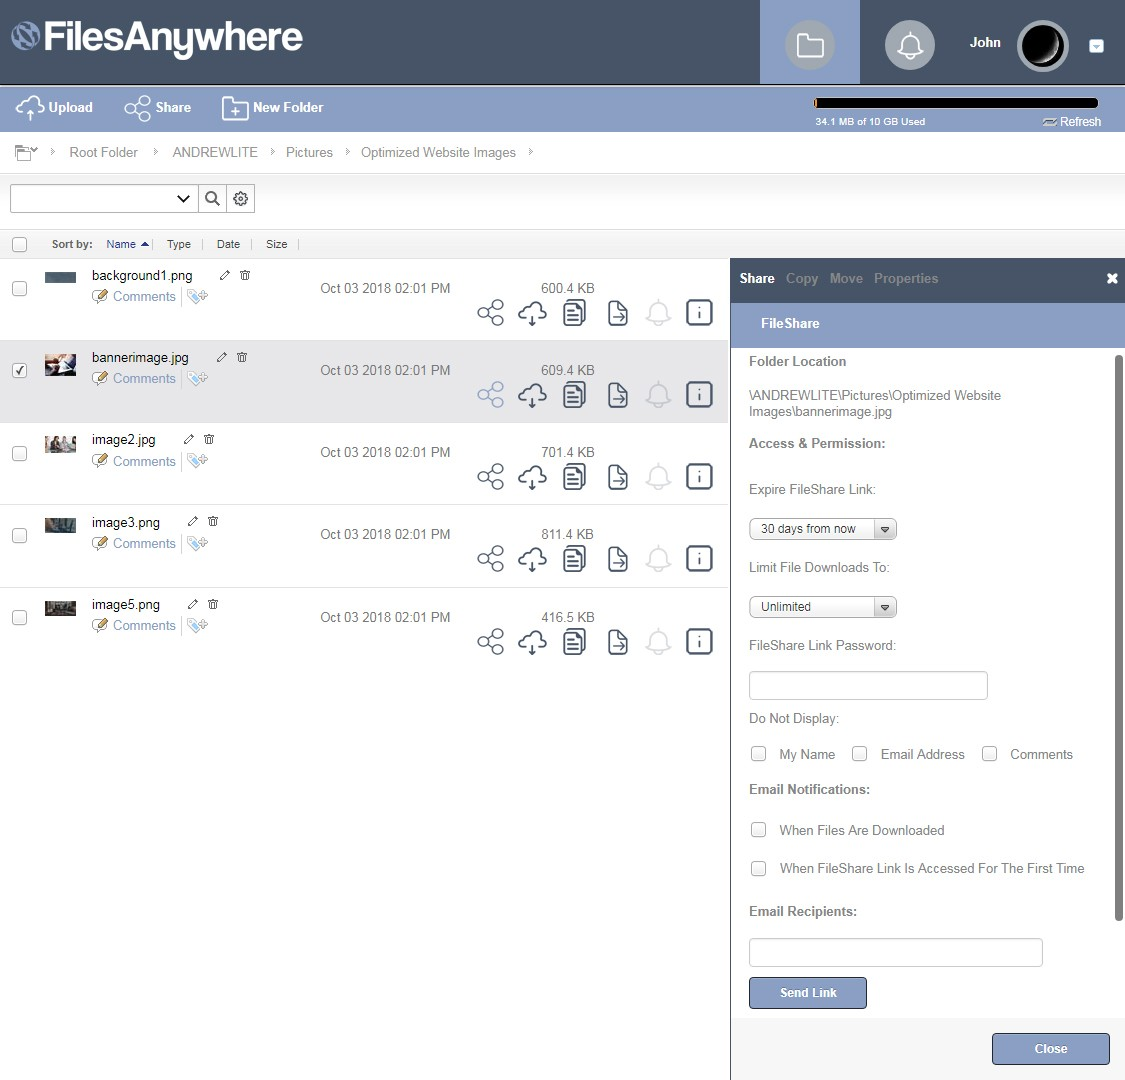 FilesAnywhere Lite FileShare Link